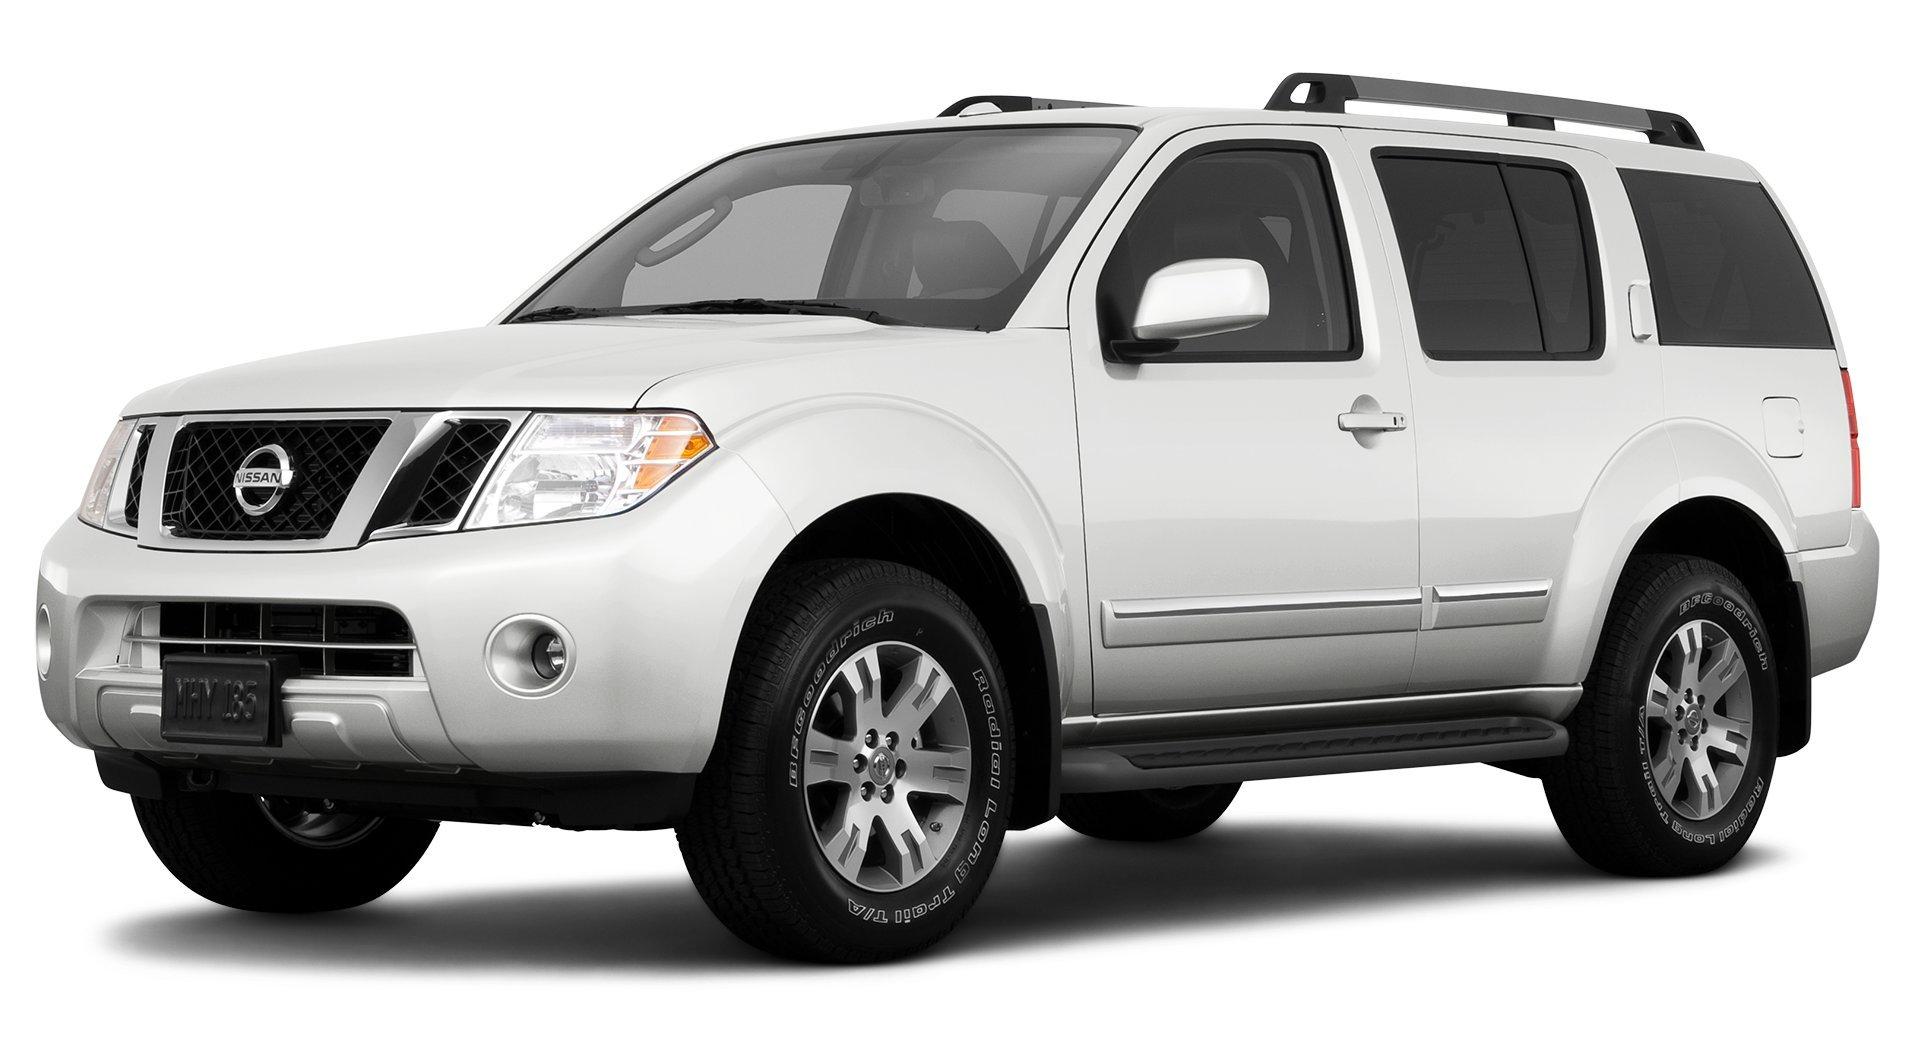 2011 Nissan Pathfinder LE, 2 Wheel Drive 4 Door V6 ...